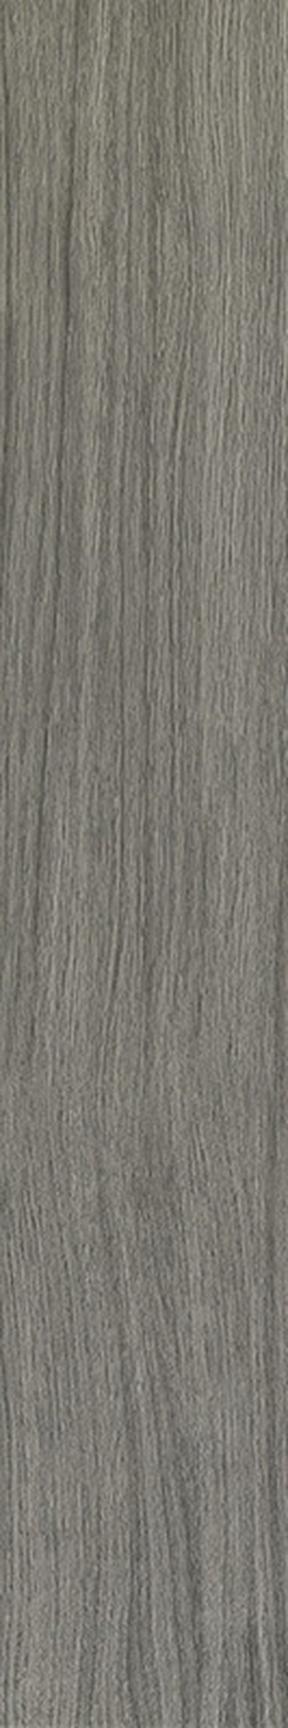 Proof Floor/Wall Tile 8x48